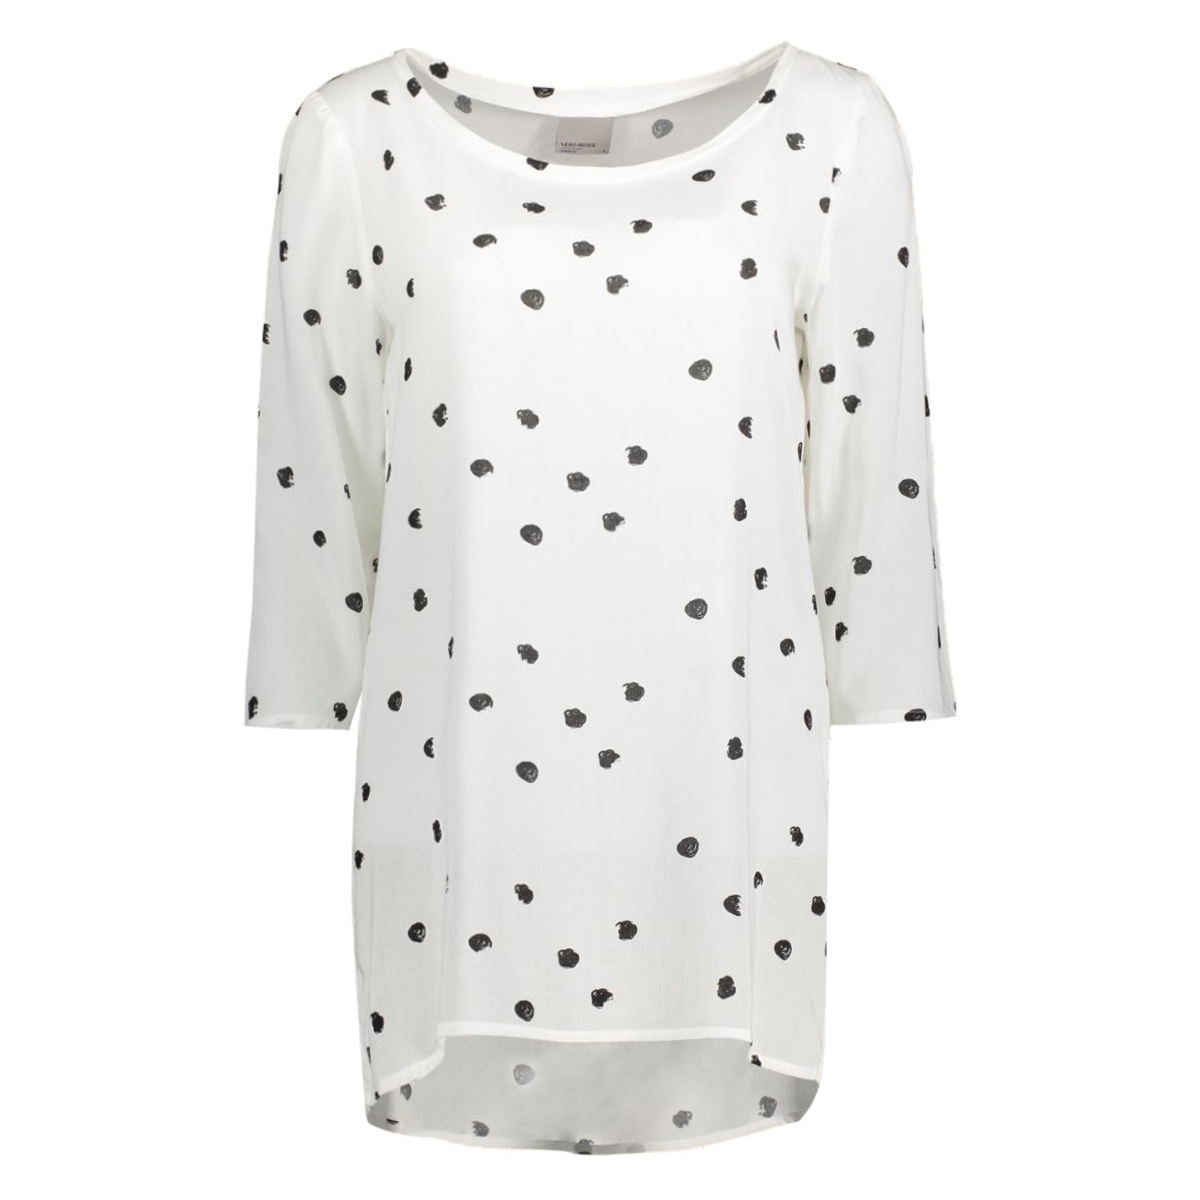 vmdottie long 3/4 top nfs 10175178 vero moda t-shirt snow white/black dot